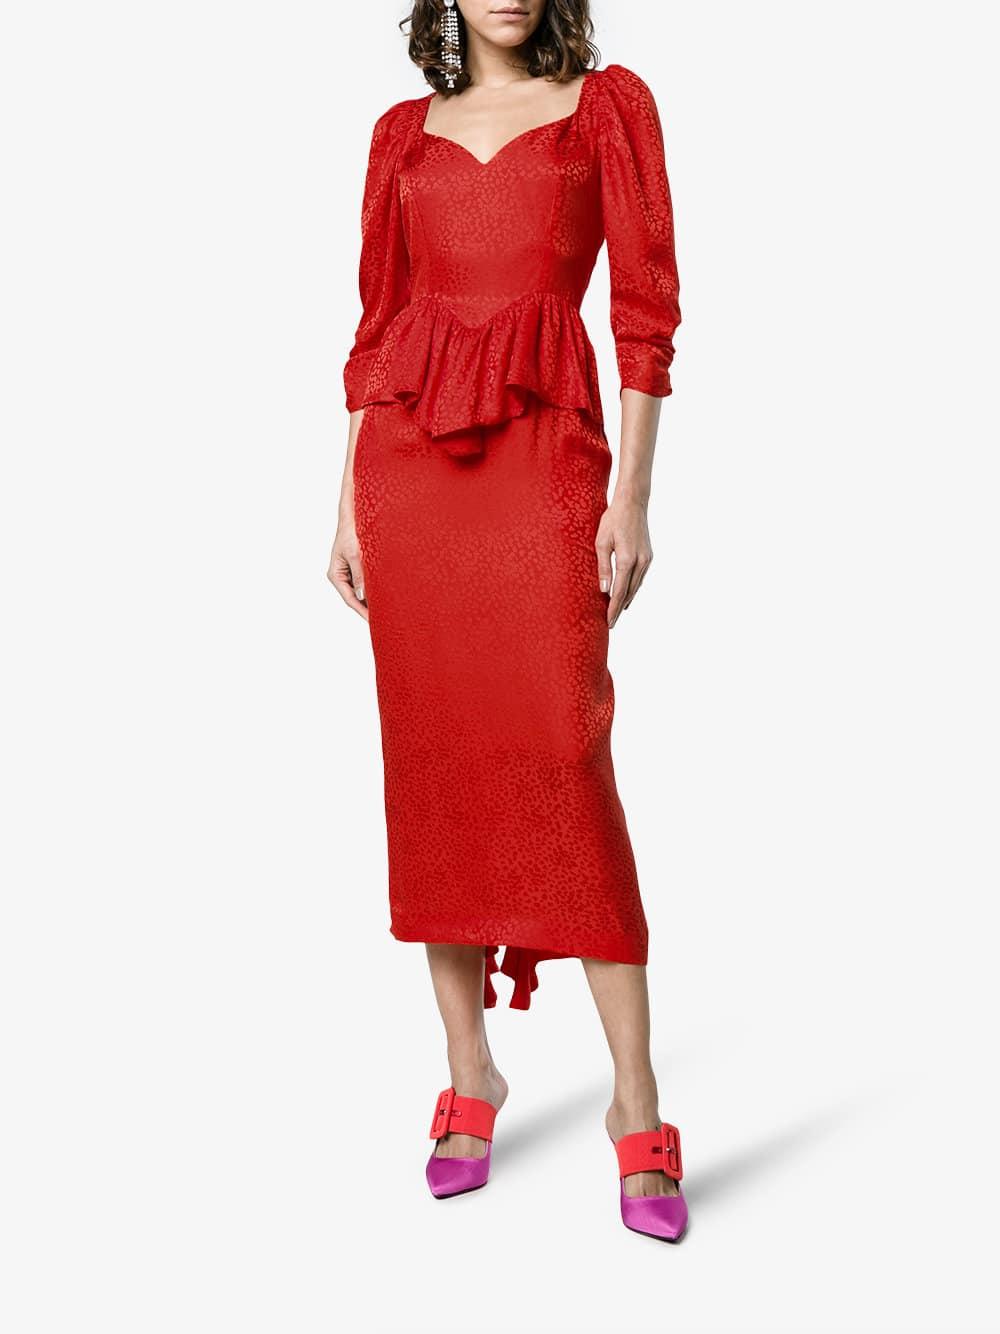 0fa446f28c24d STELLA MCCARTNEY Silk Angela Leopard Red Dress - We Select Dresses